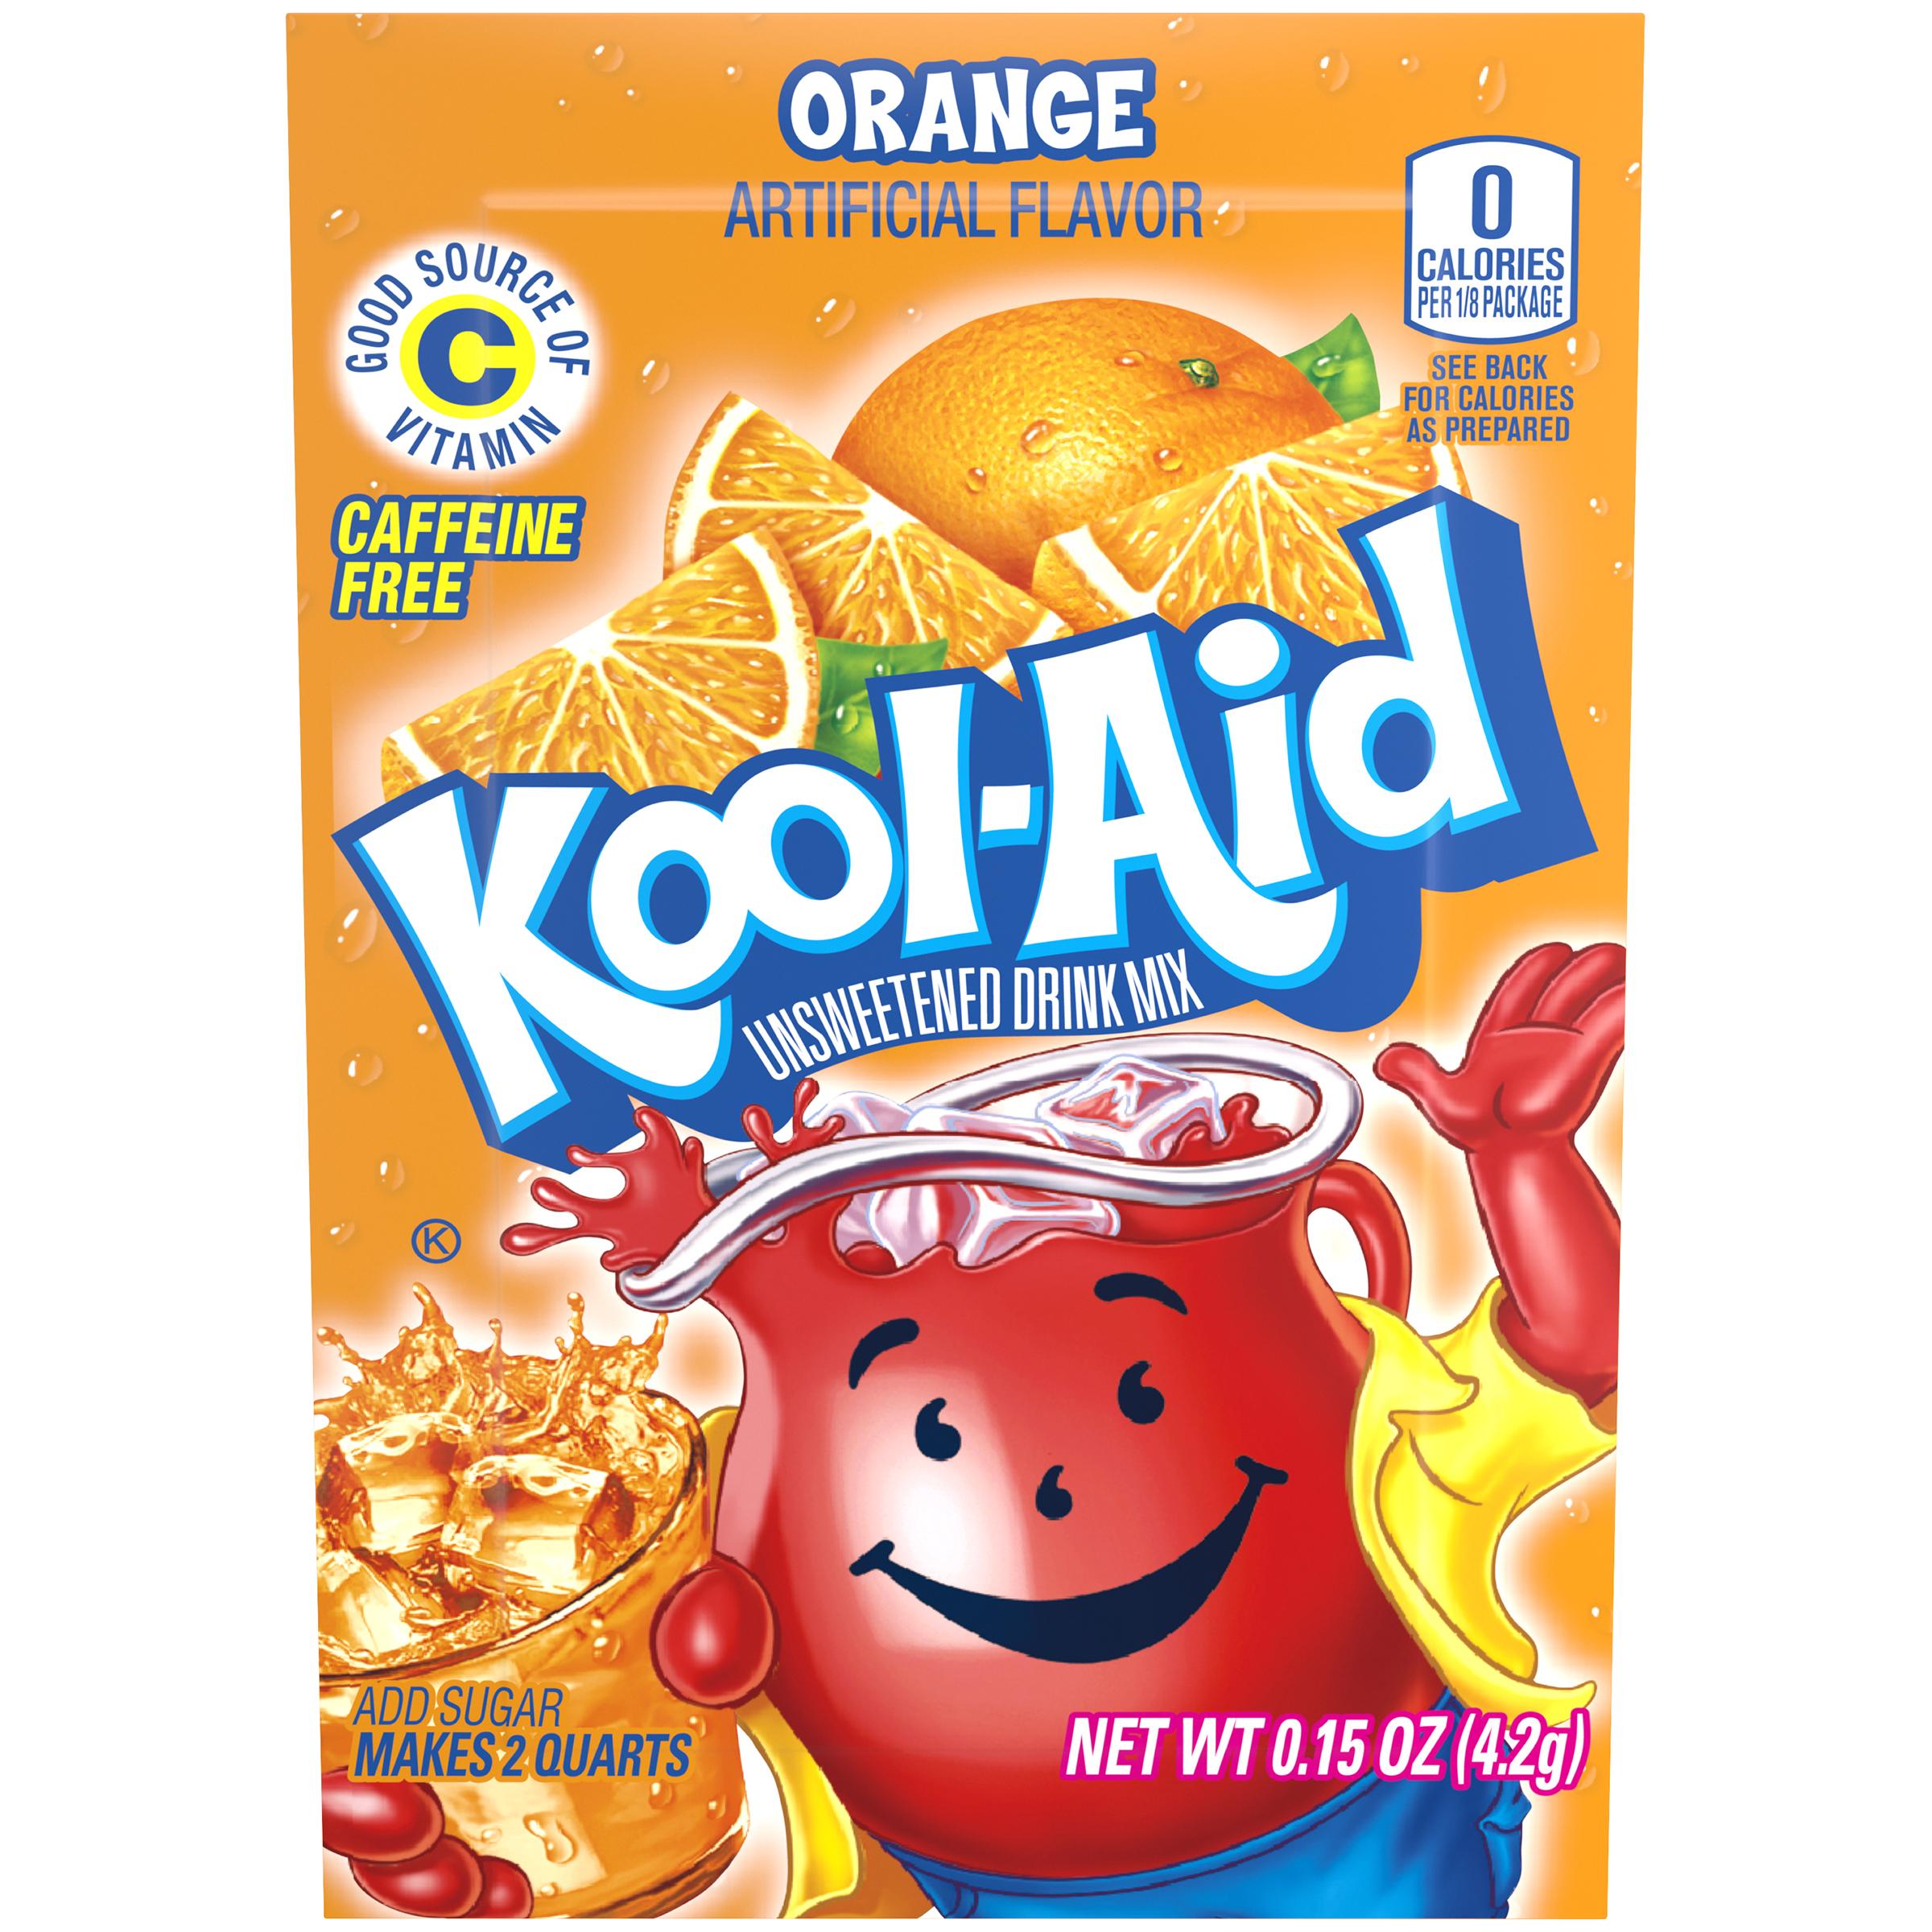 KOOL-AID Orange Drink Mix Unsweetened 0.15 oz Packet image